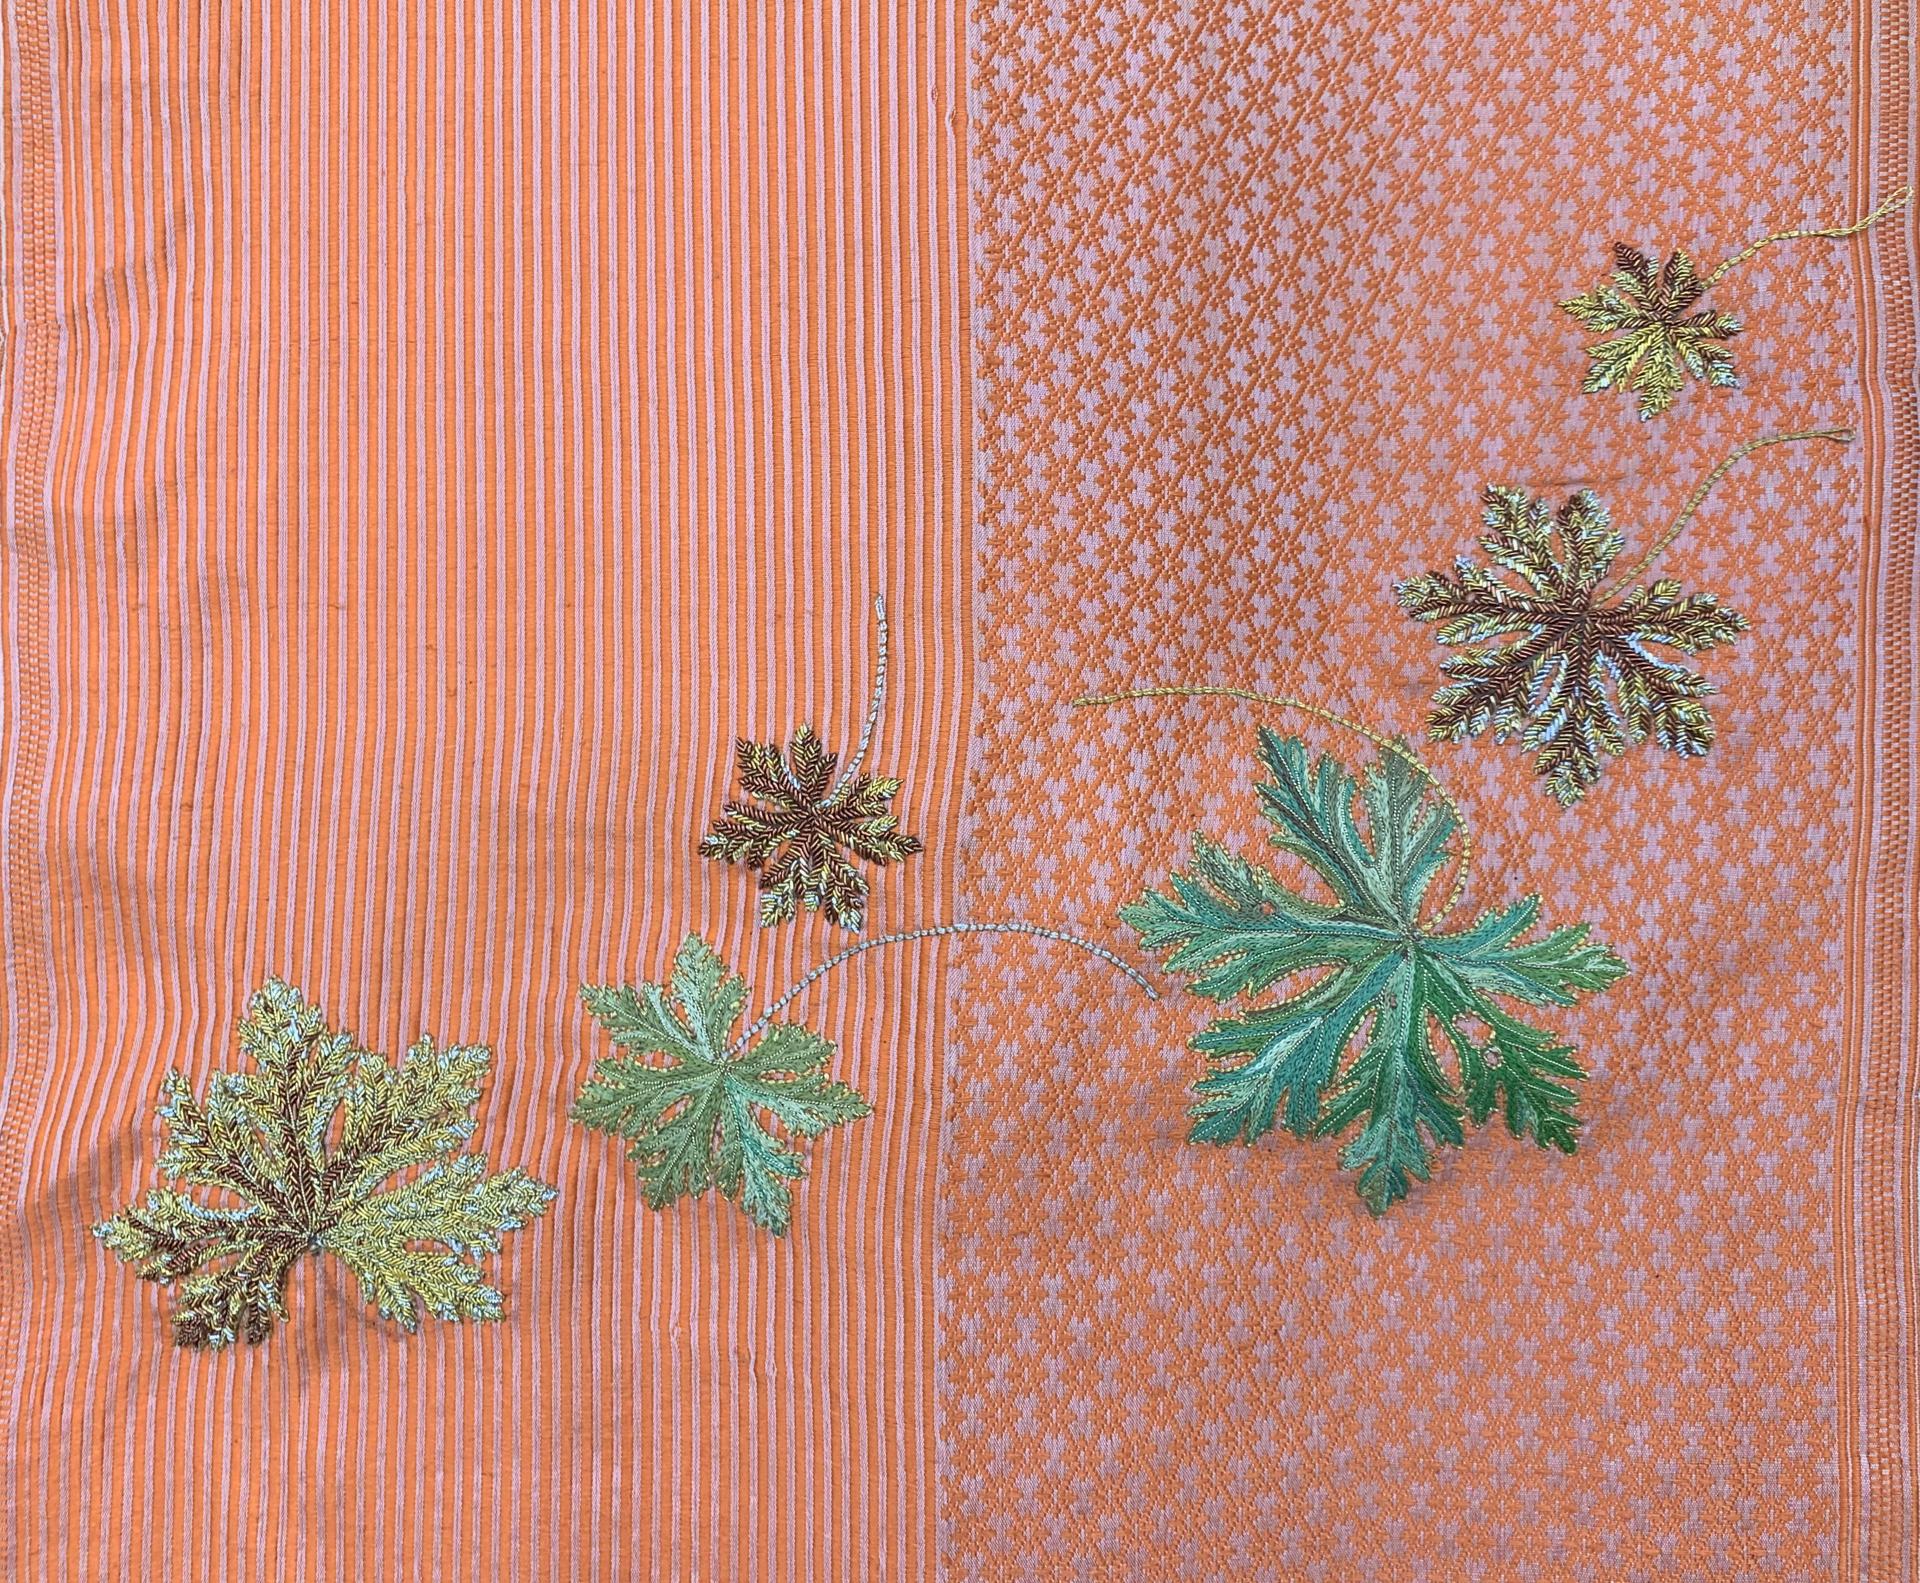 Meditation Screen I: Geranium Leaves by Tiao Nithakhong Somsanith